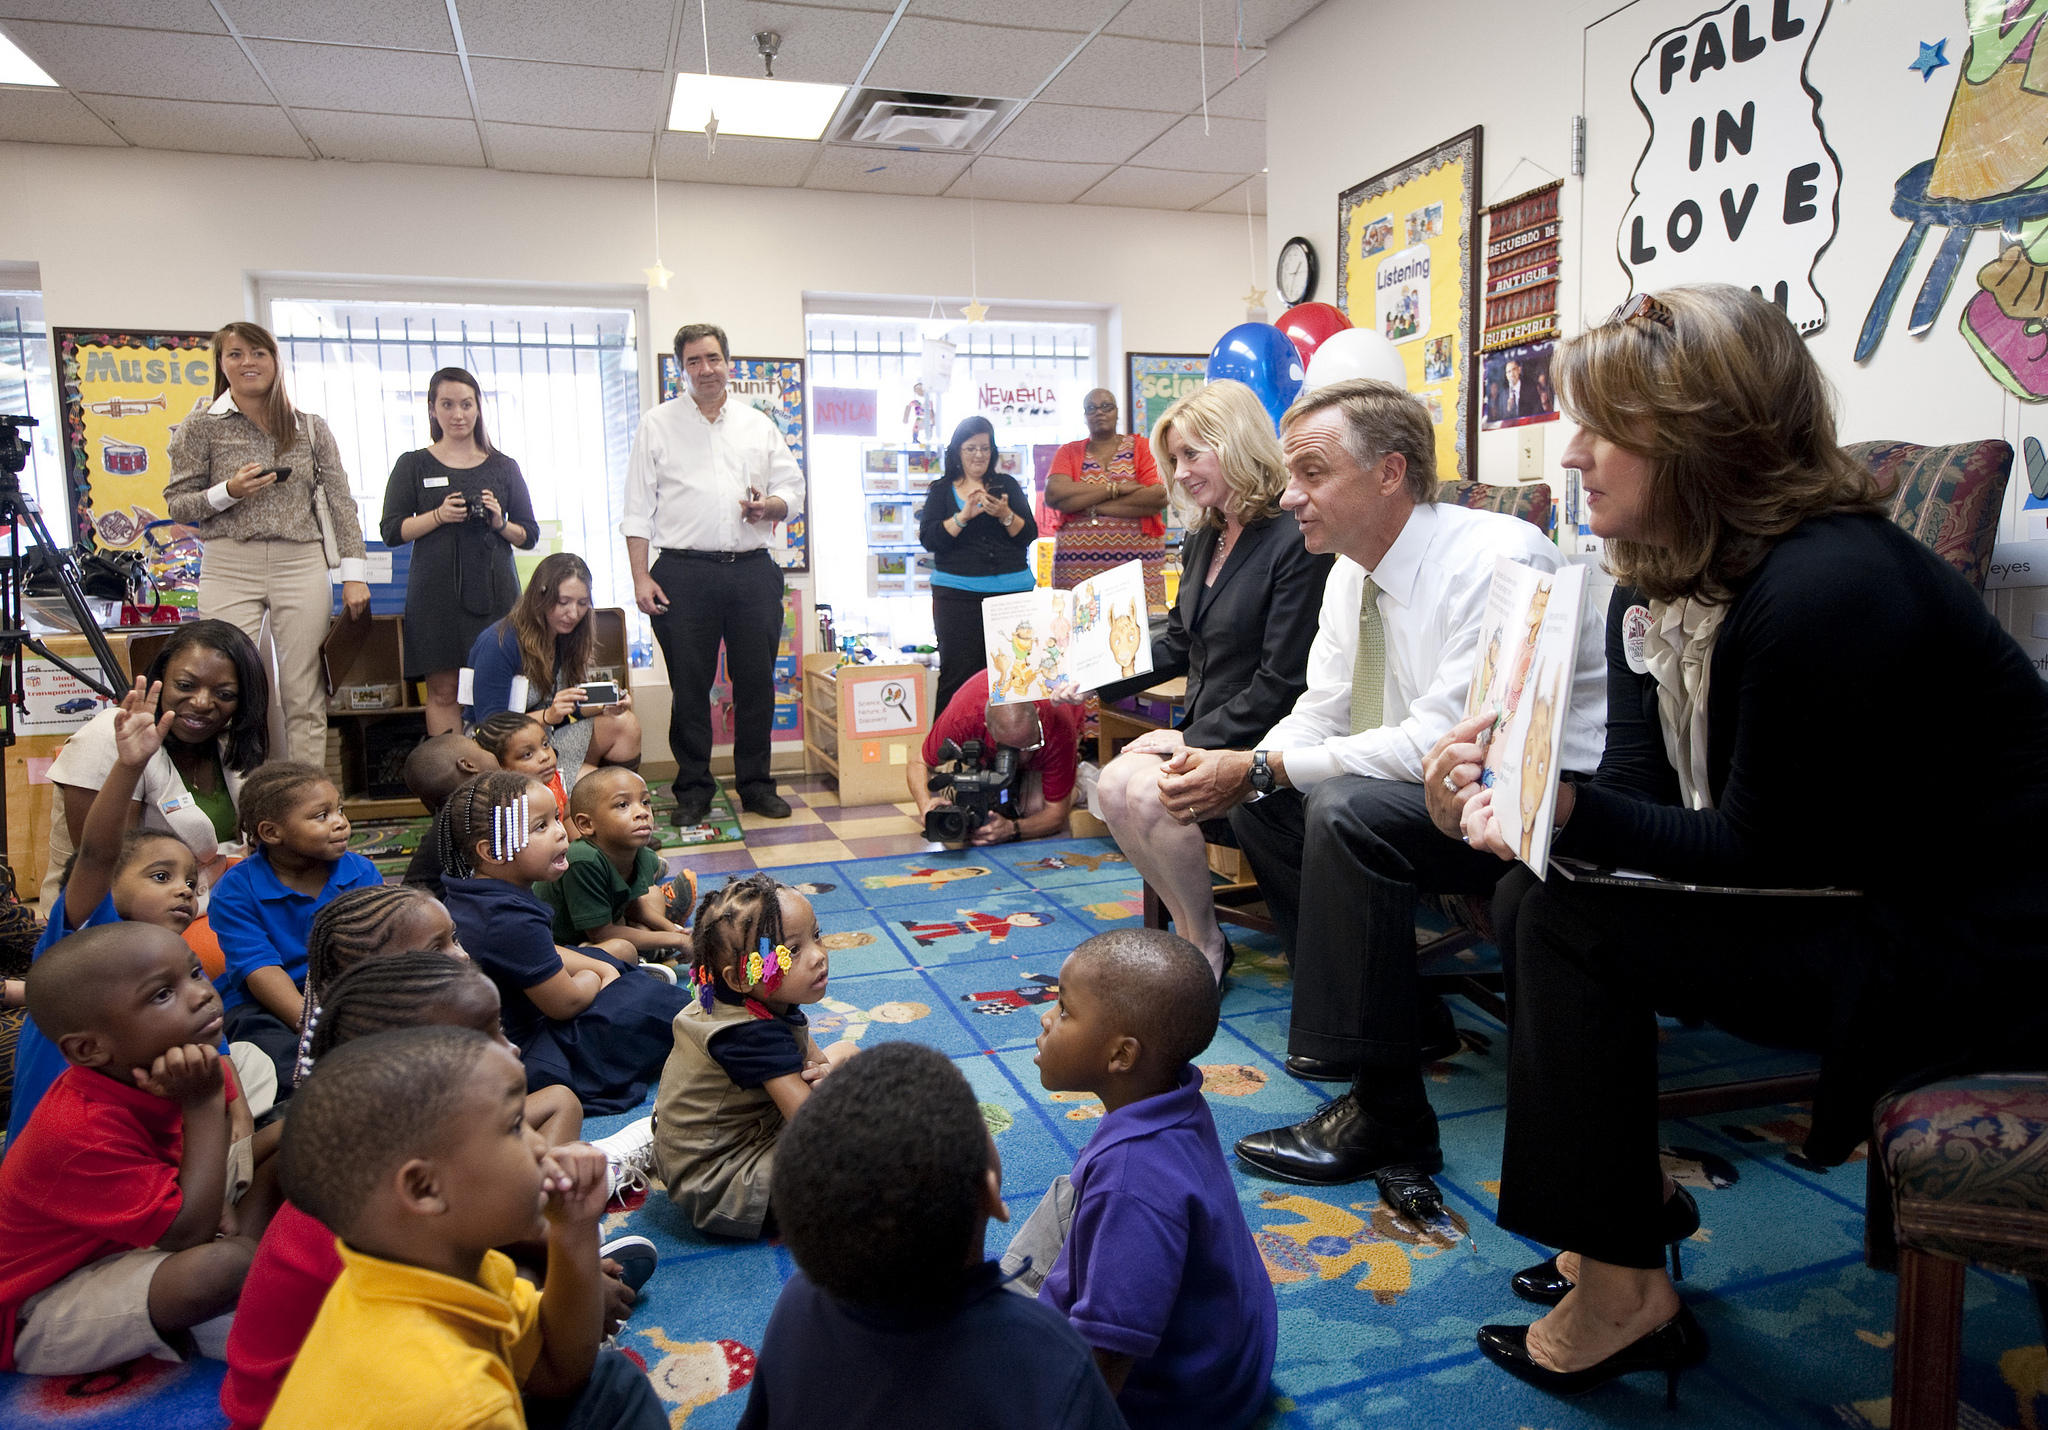 nashville preschool awaited vanderbilt pre k study finds benefits lacking 821